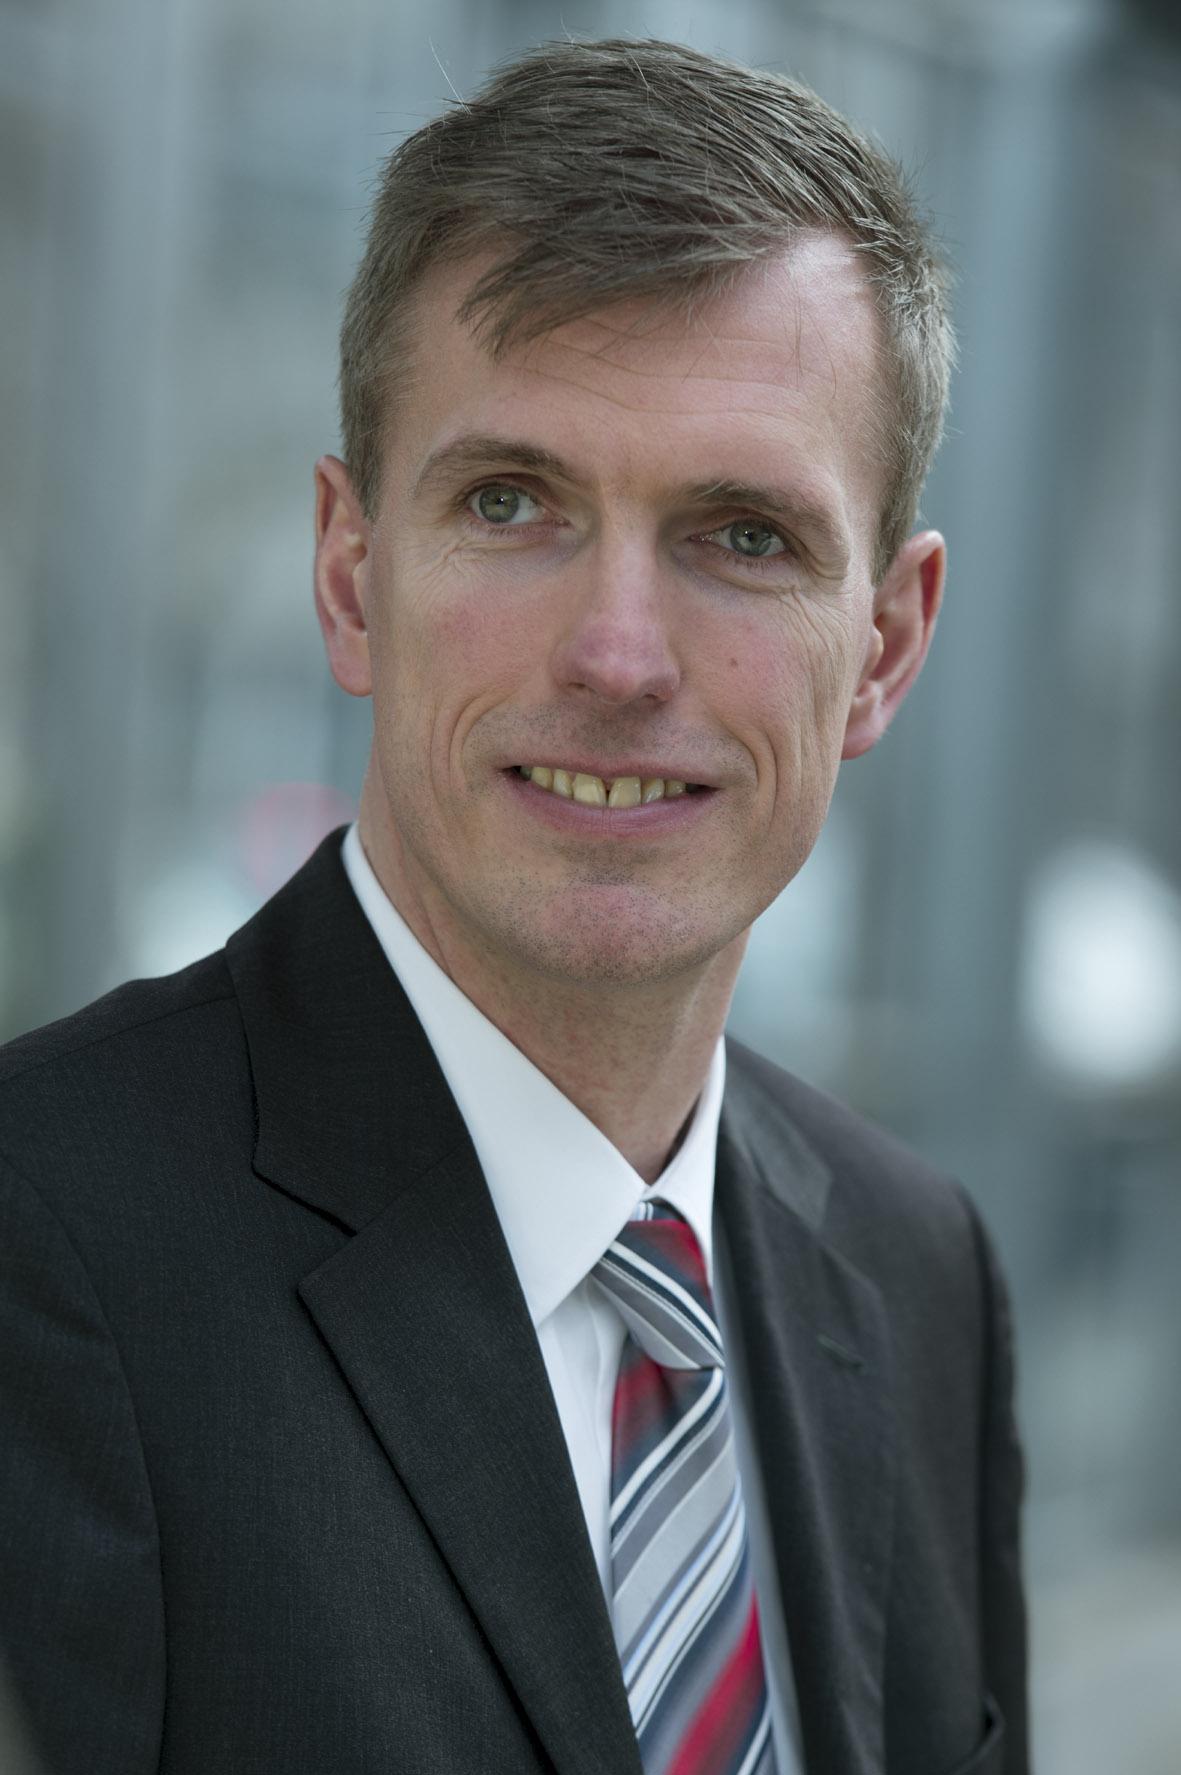 Marcel Schulze Bomke-Vossschulte